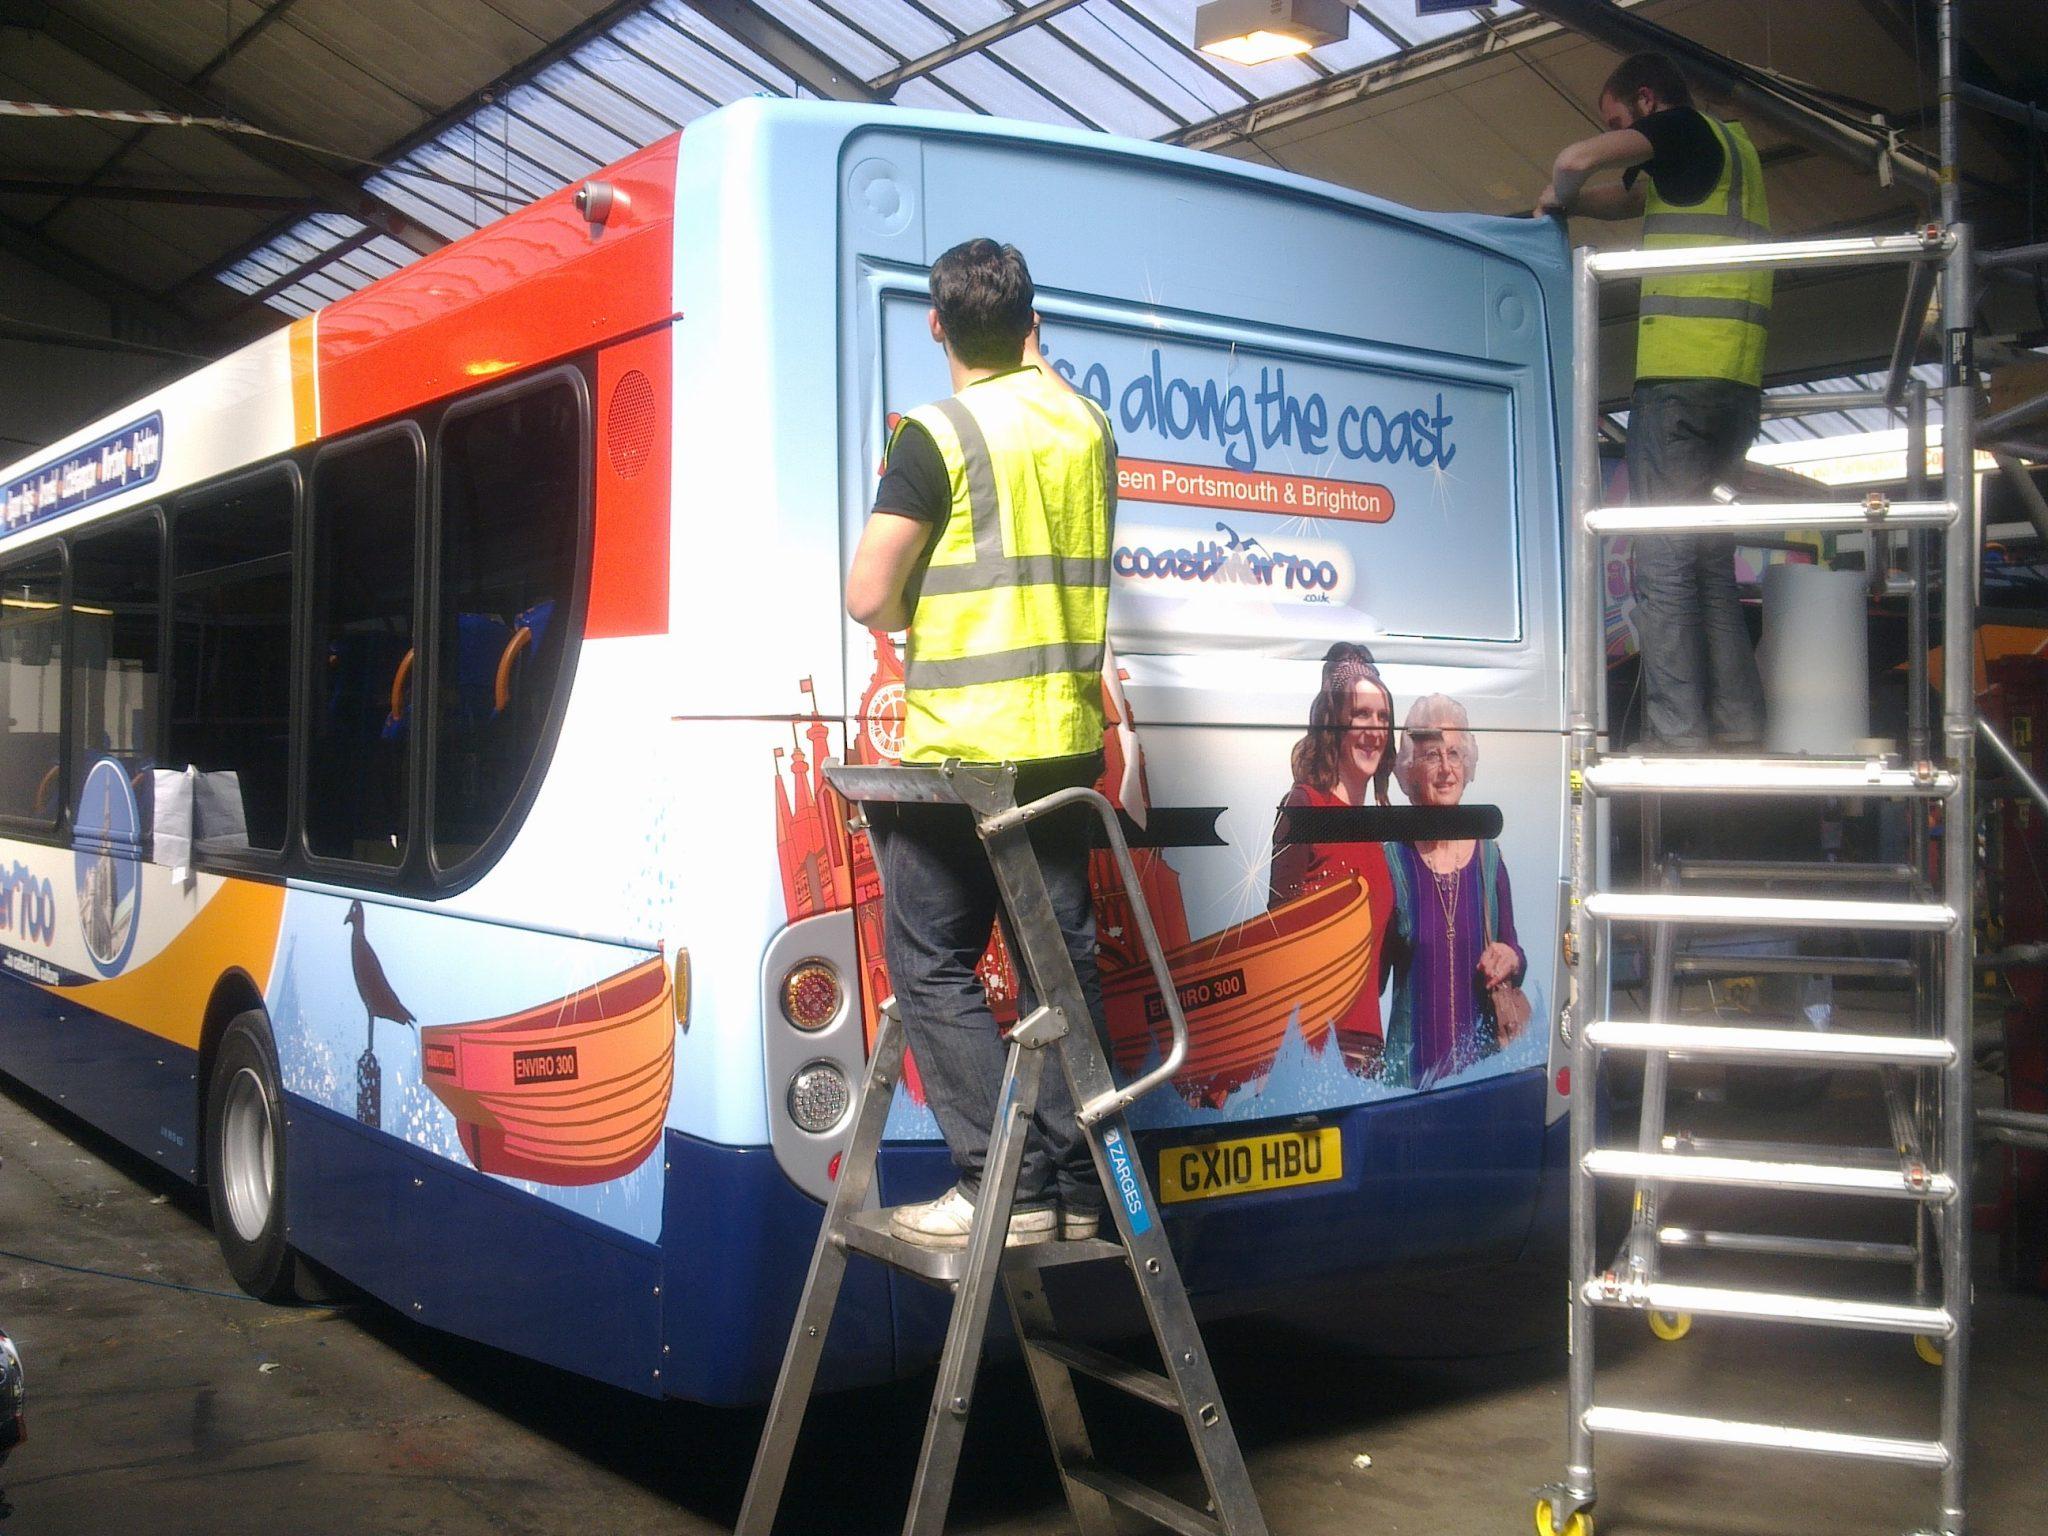 Coastliners route branding - bus livery design